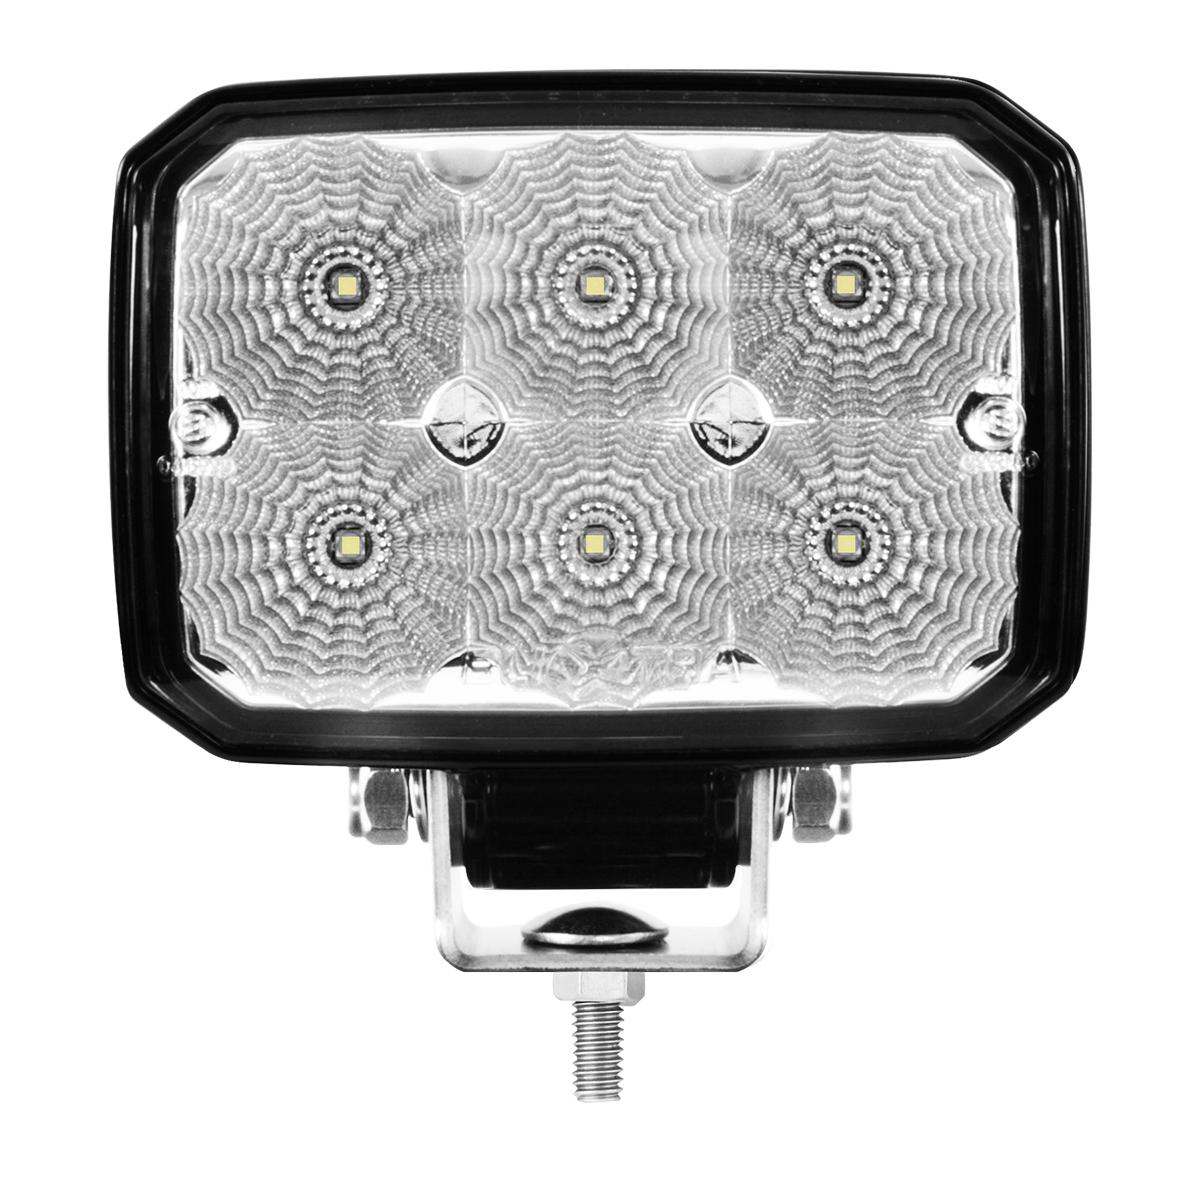 76360 Medium High Power LED Work Light